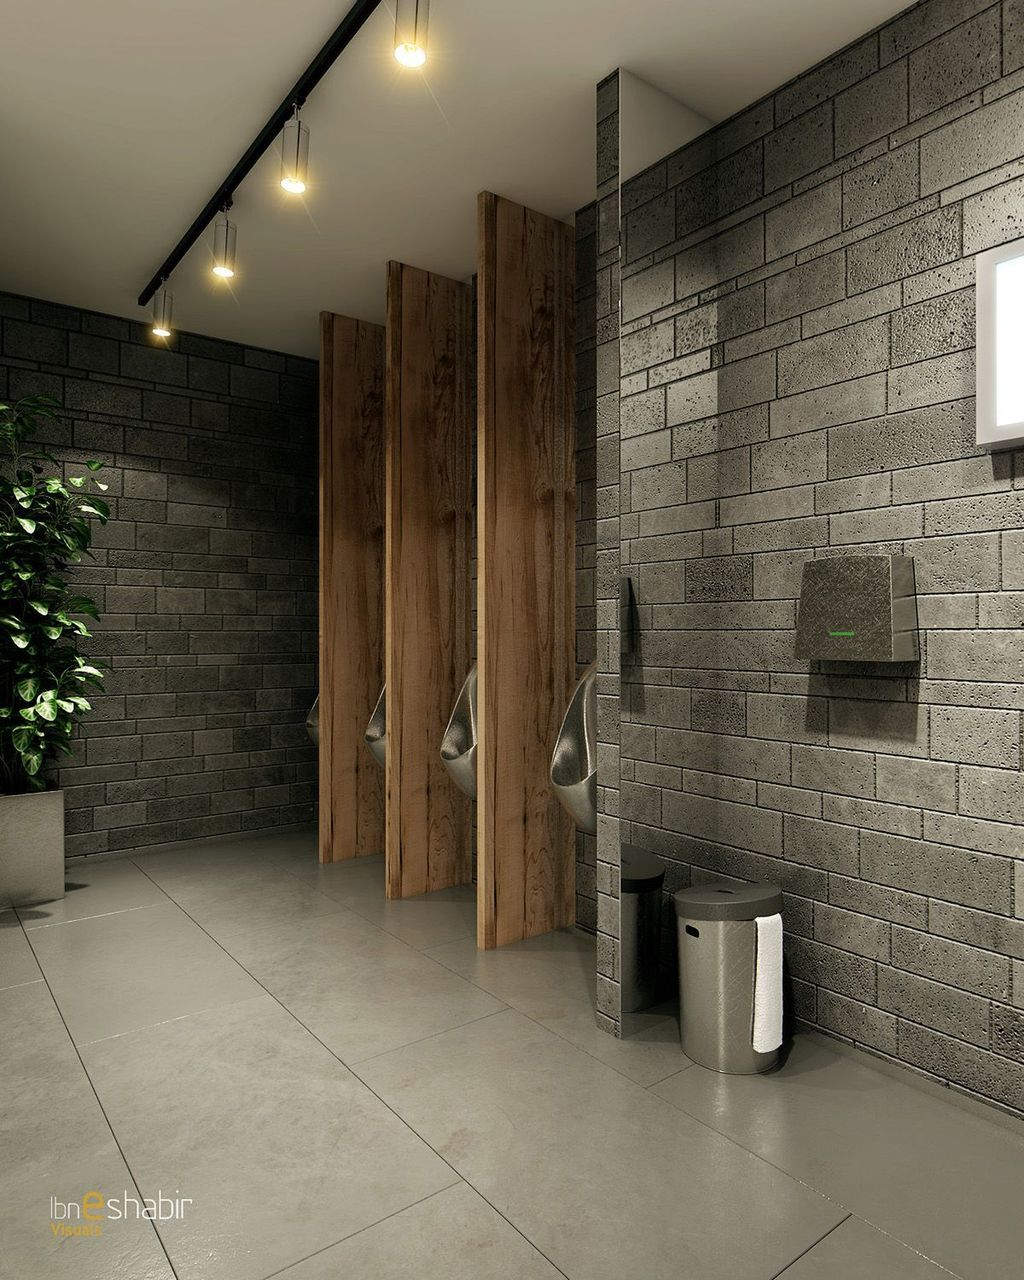 42 Elegant Public Bathroom Design Ideas That Looks Adorable In 2020 Commercial Bathroom Designs Restroom Design Public Restroom Design